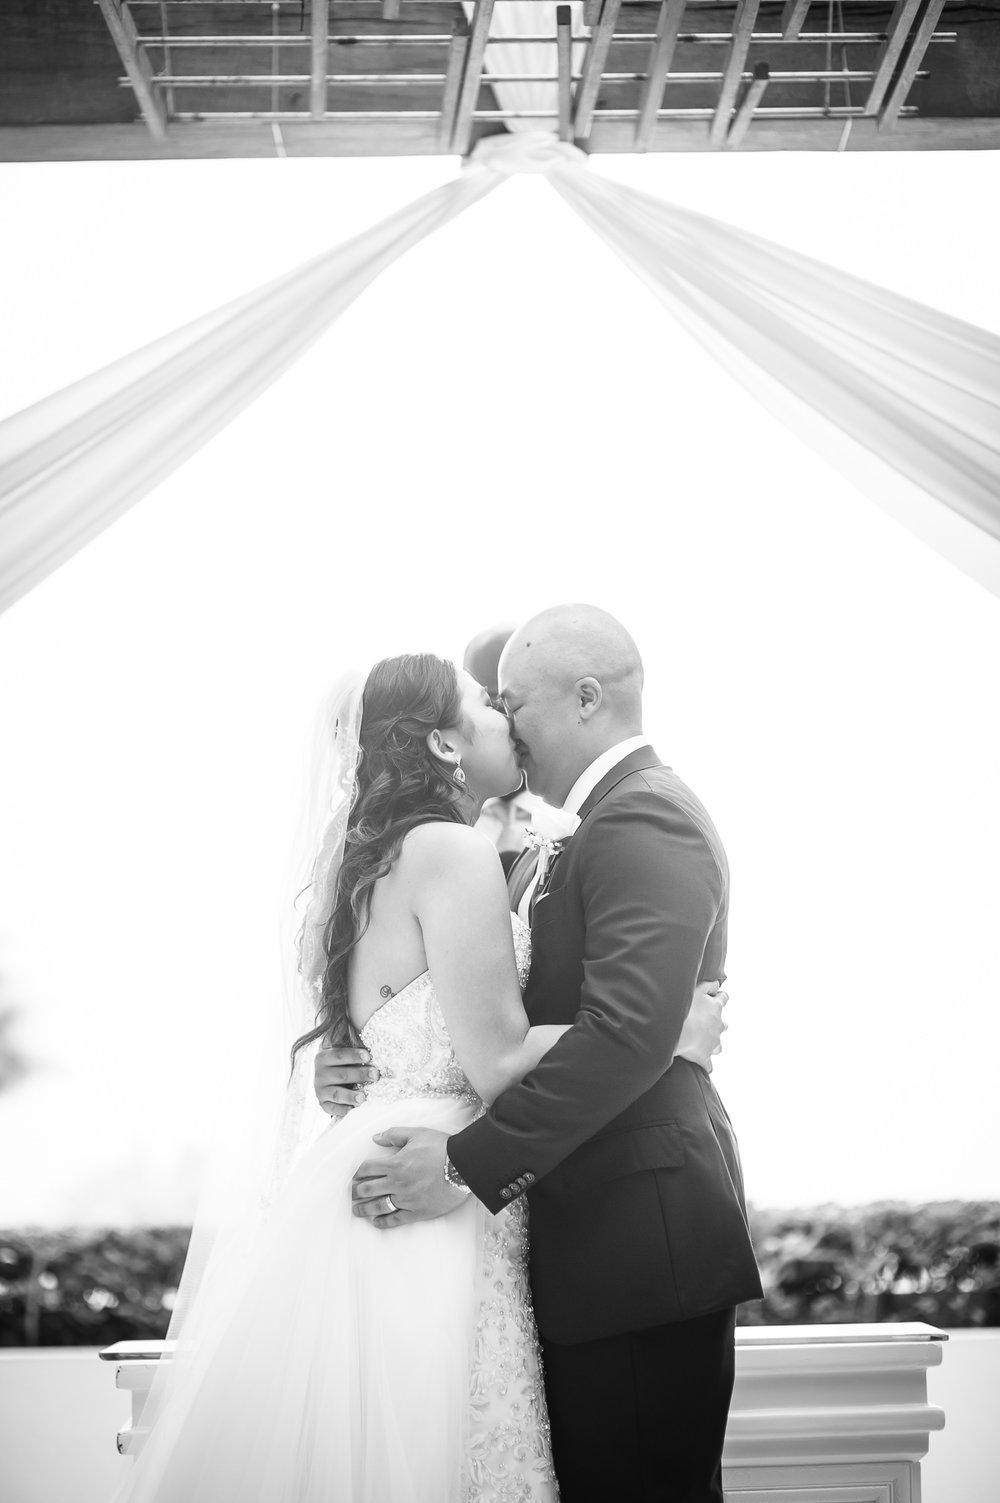 31-David Loi Studios - Cancun - Mexico - Destination Wedding-15691.jpg